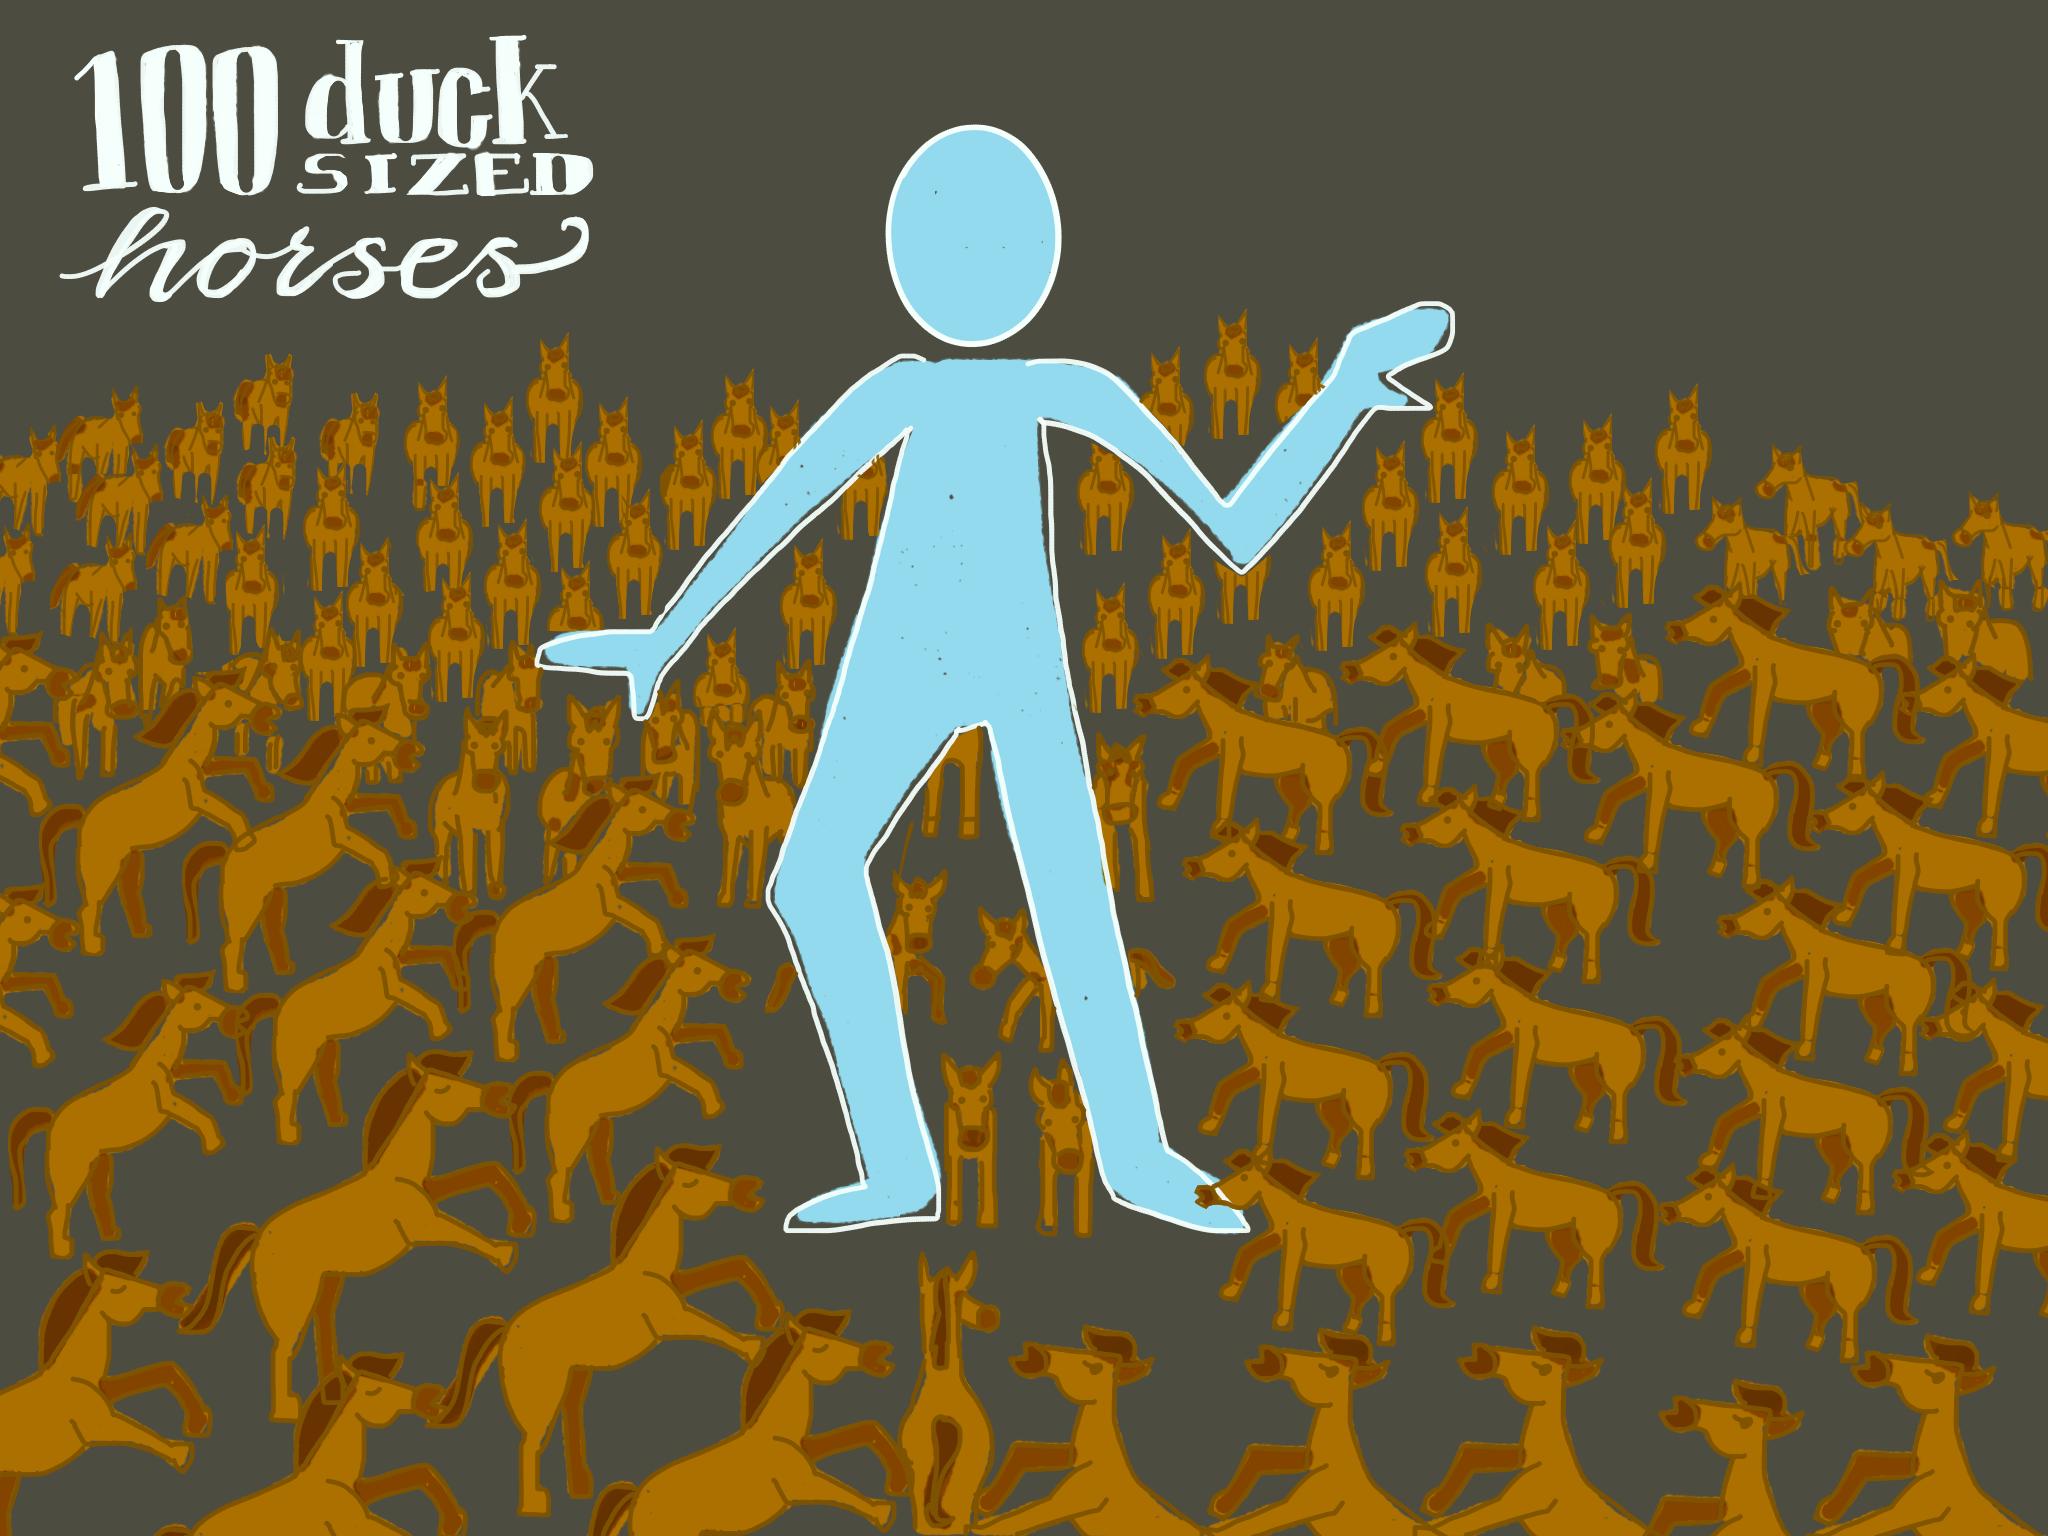 100 duck sized horses